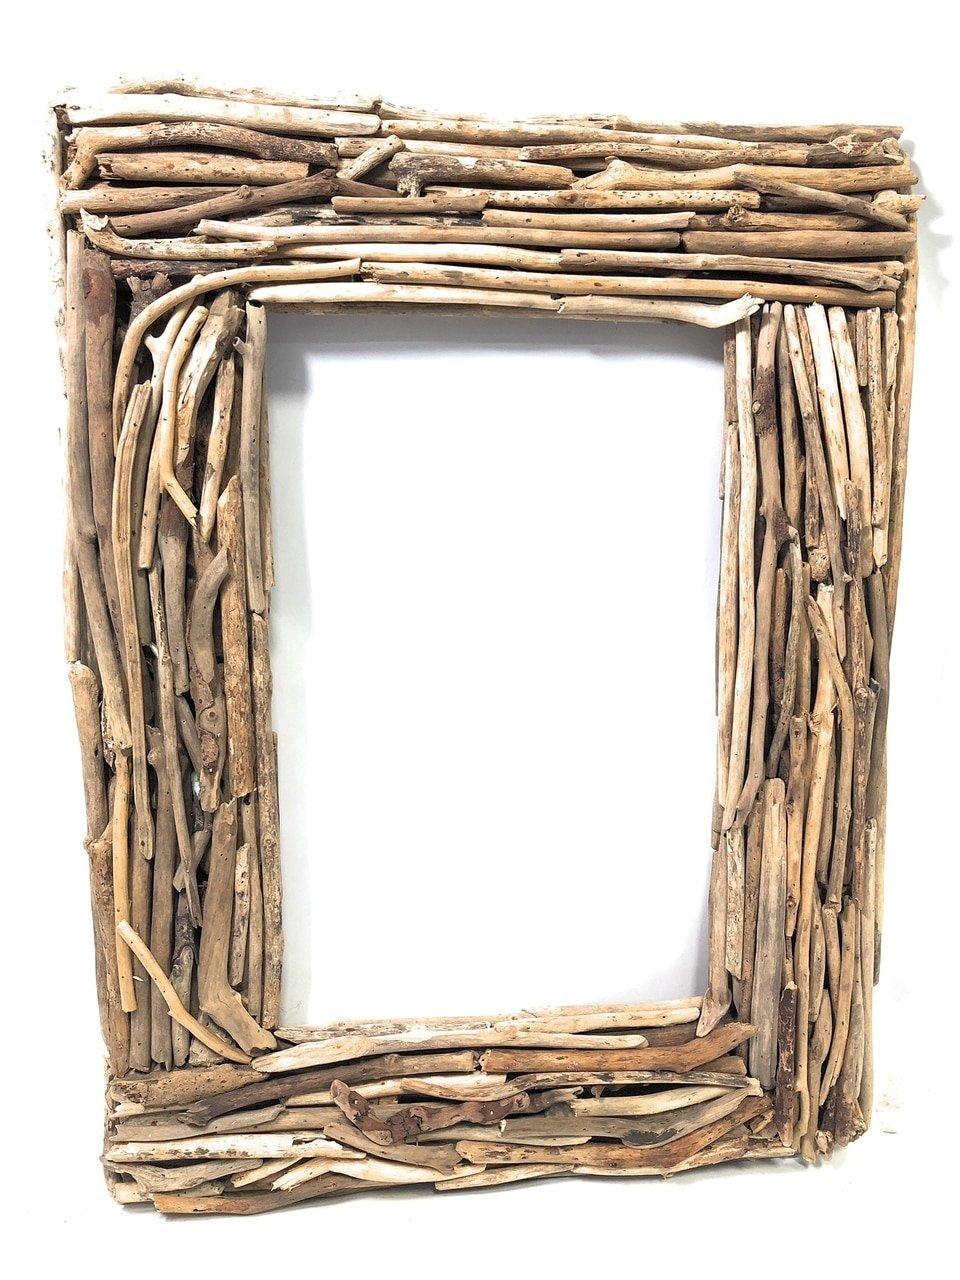 TikiMaster Driftwood Frame 32'' X 24'' - Coastal Living   #lis31005f